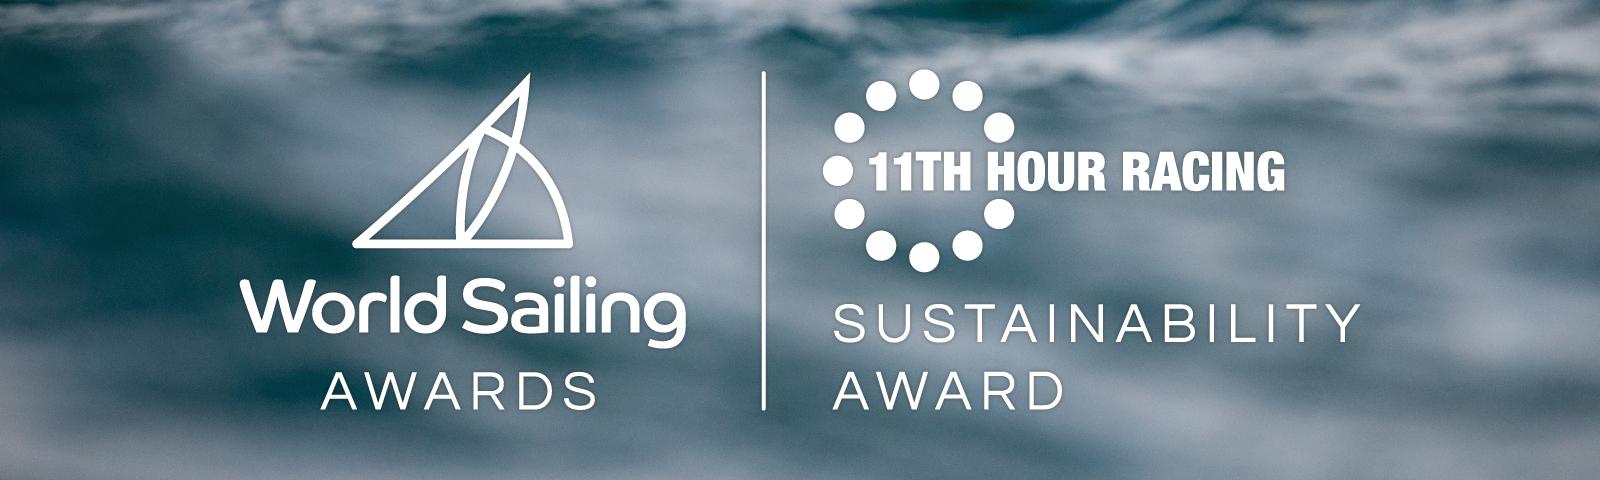 world-sailing-award-landing-page-website-background